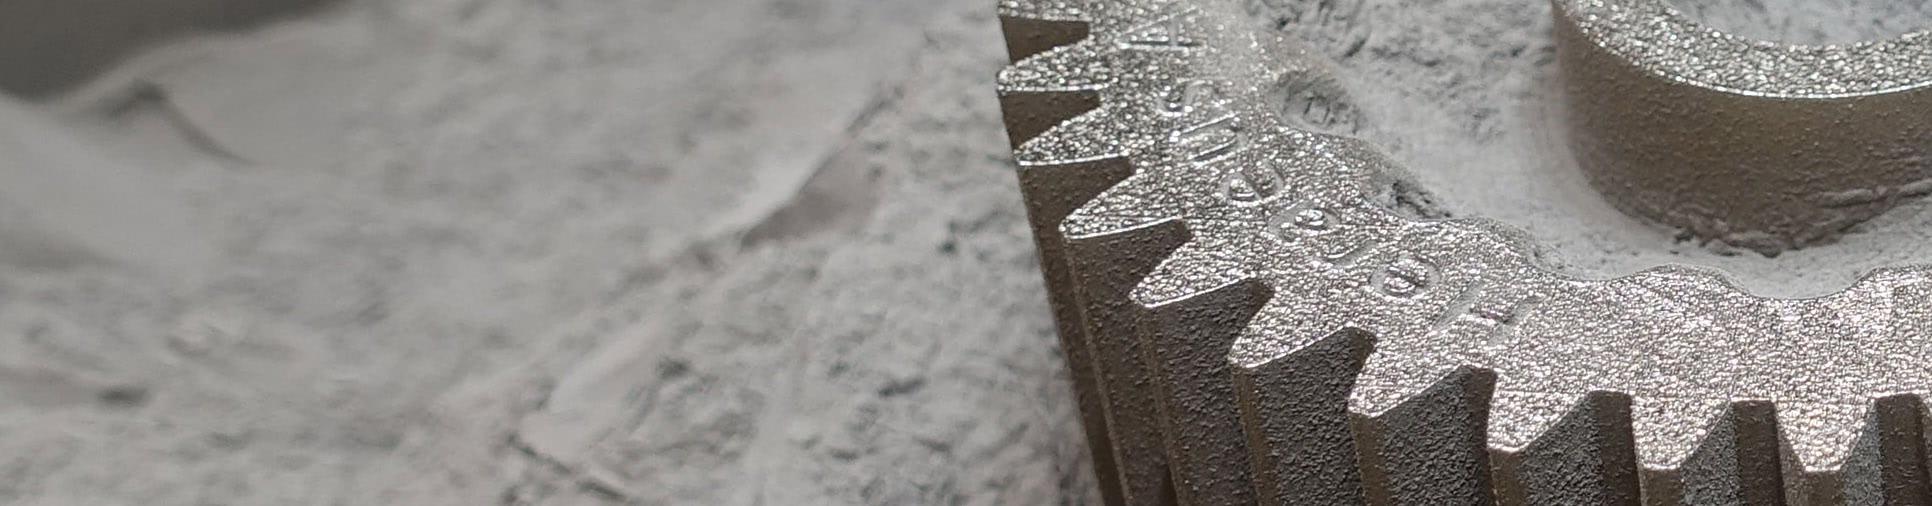 3D Printing Amorphous Metals